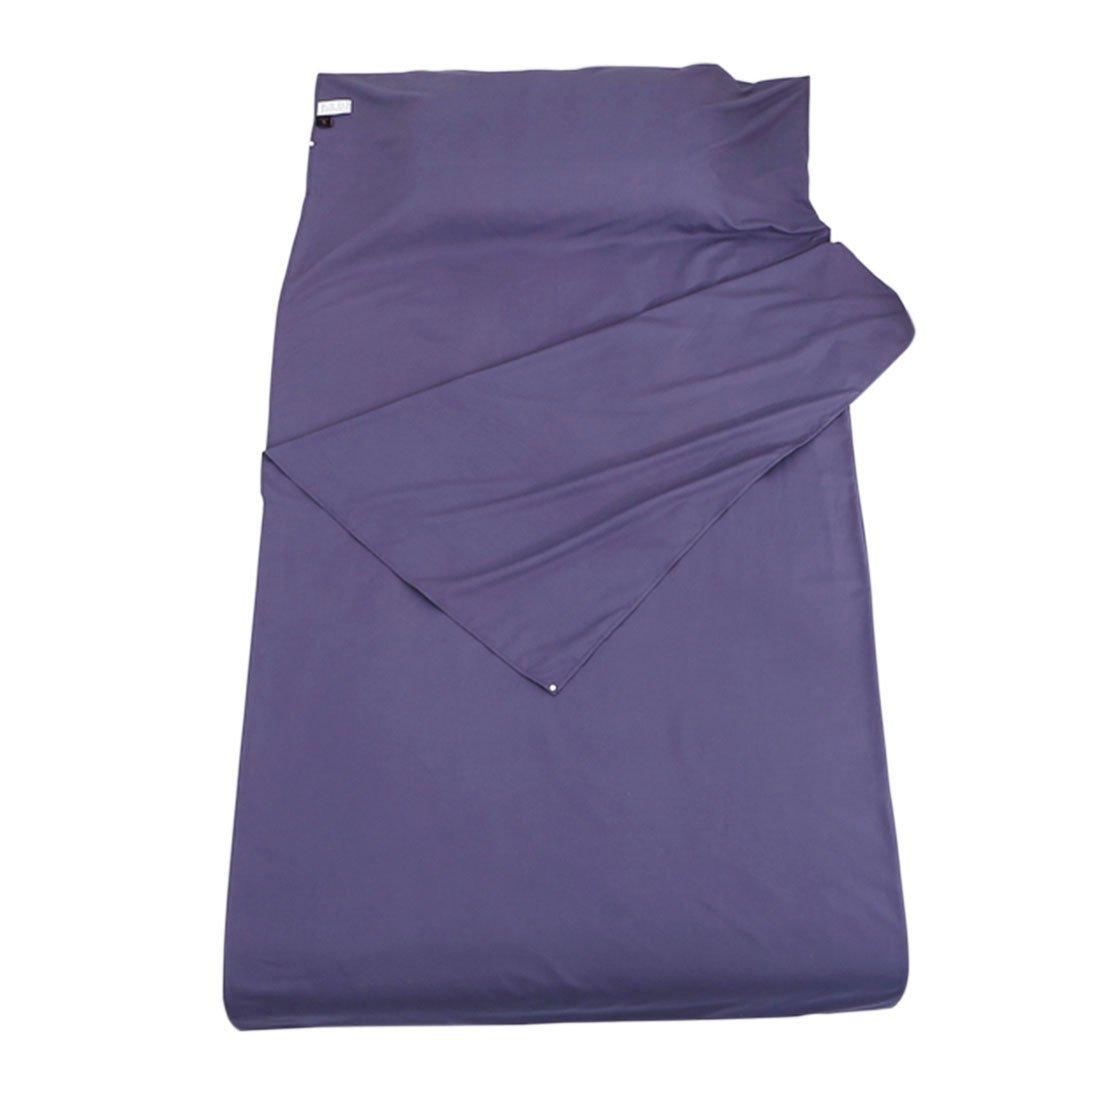 enerhu Sleepingバッグライナーホテル大人用シート軽量ポータブル旅行キャンプ睡眠袋シングルダブルサイズ 115*210cm enerhu/45*83